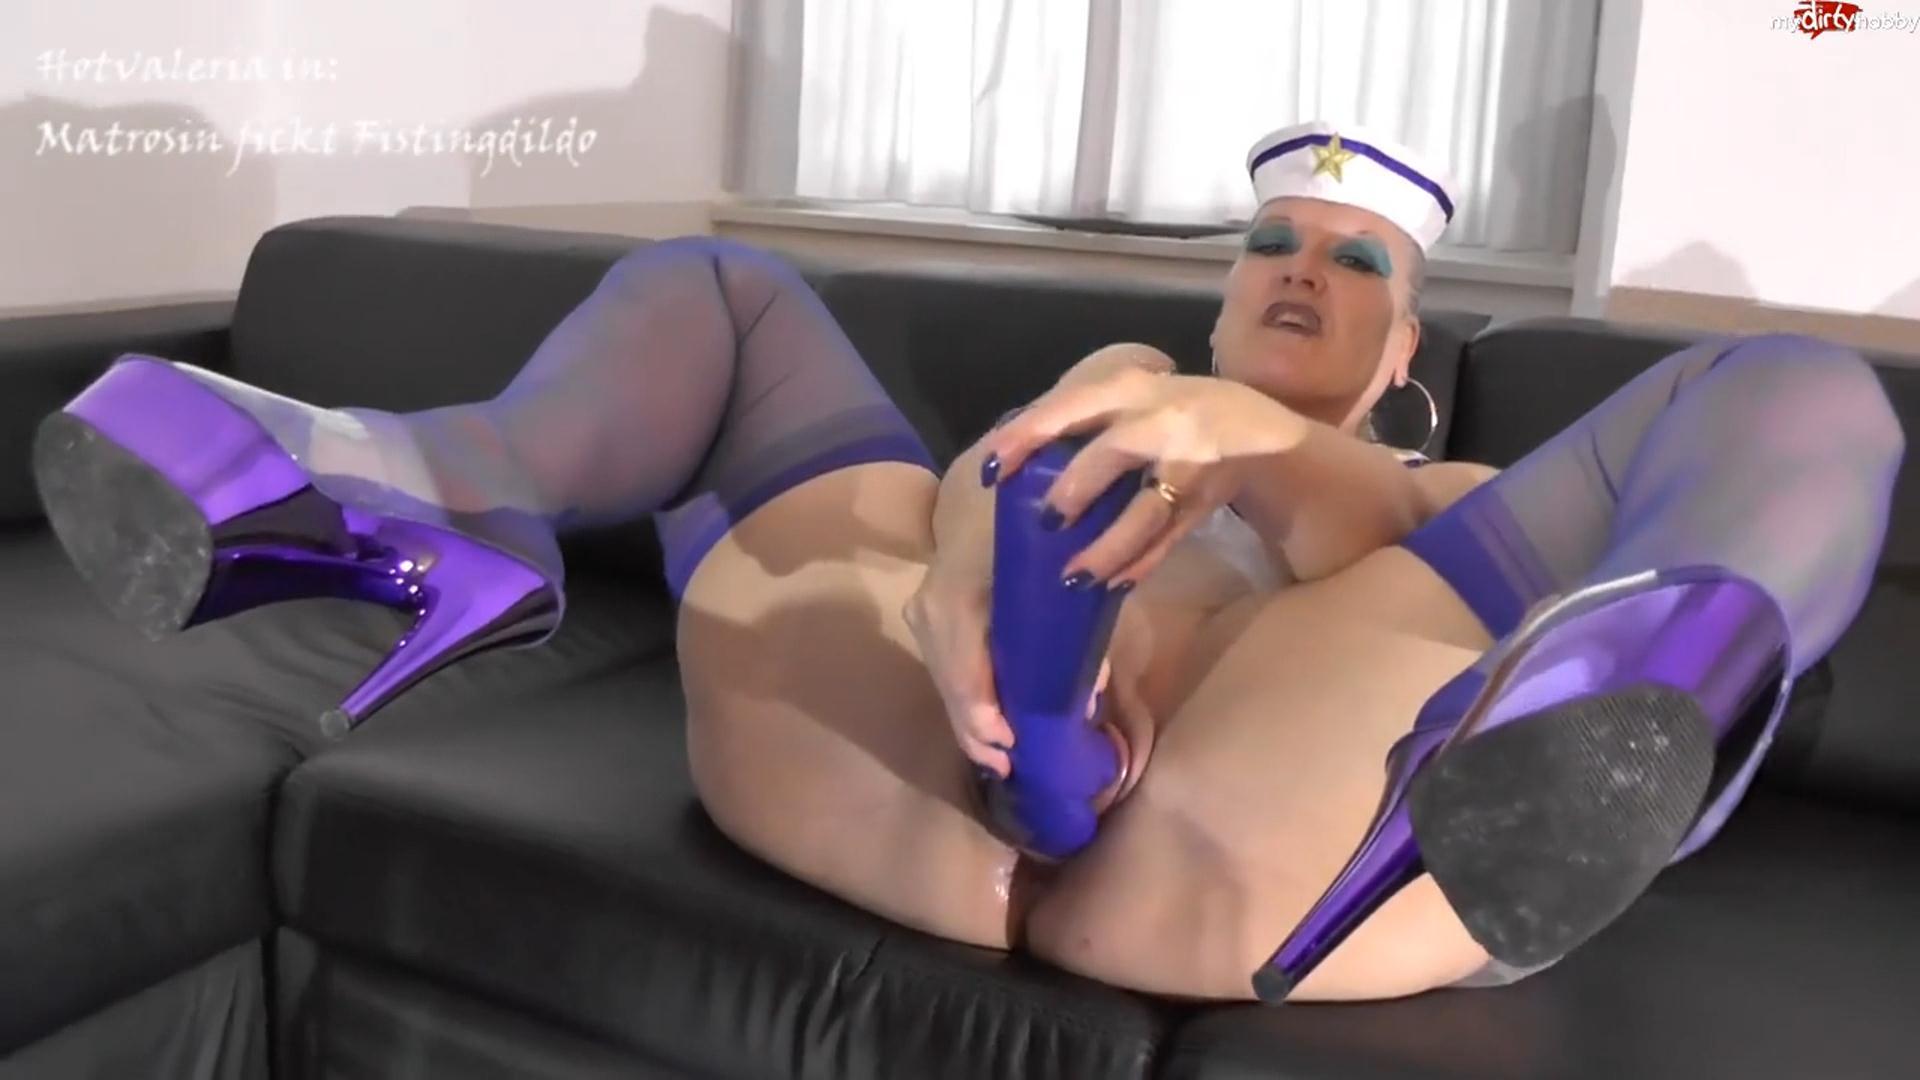 Diane keaton full frontal nude